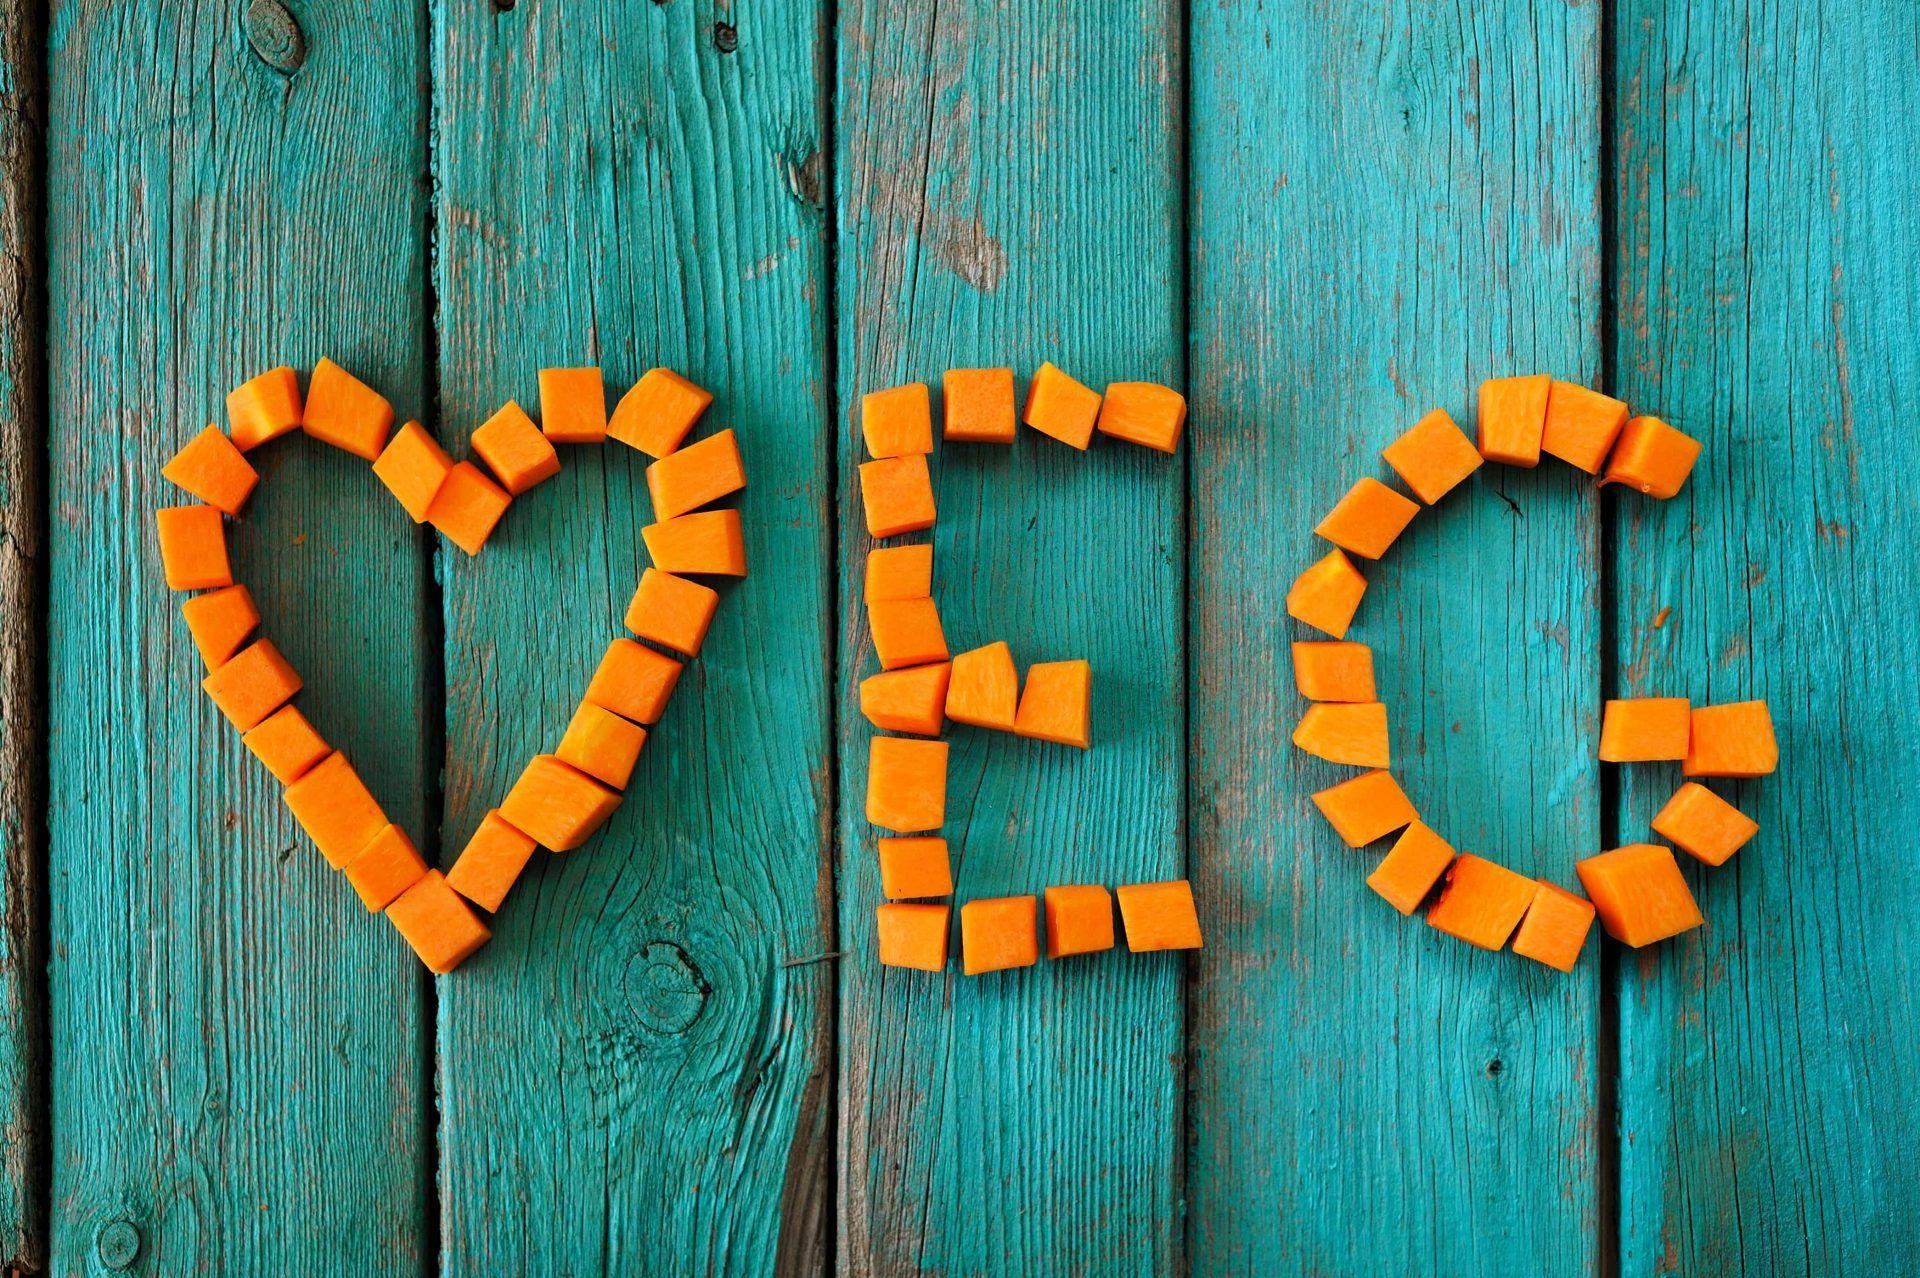 Word veg written by sweet bright pumpkin cubes on turquoise